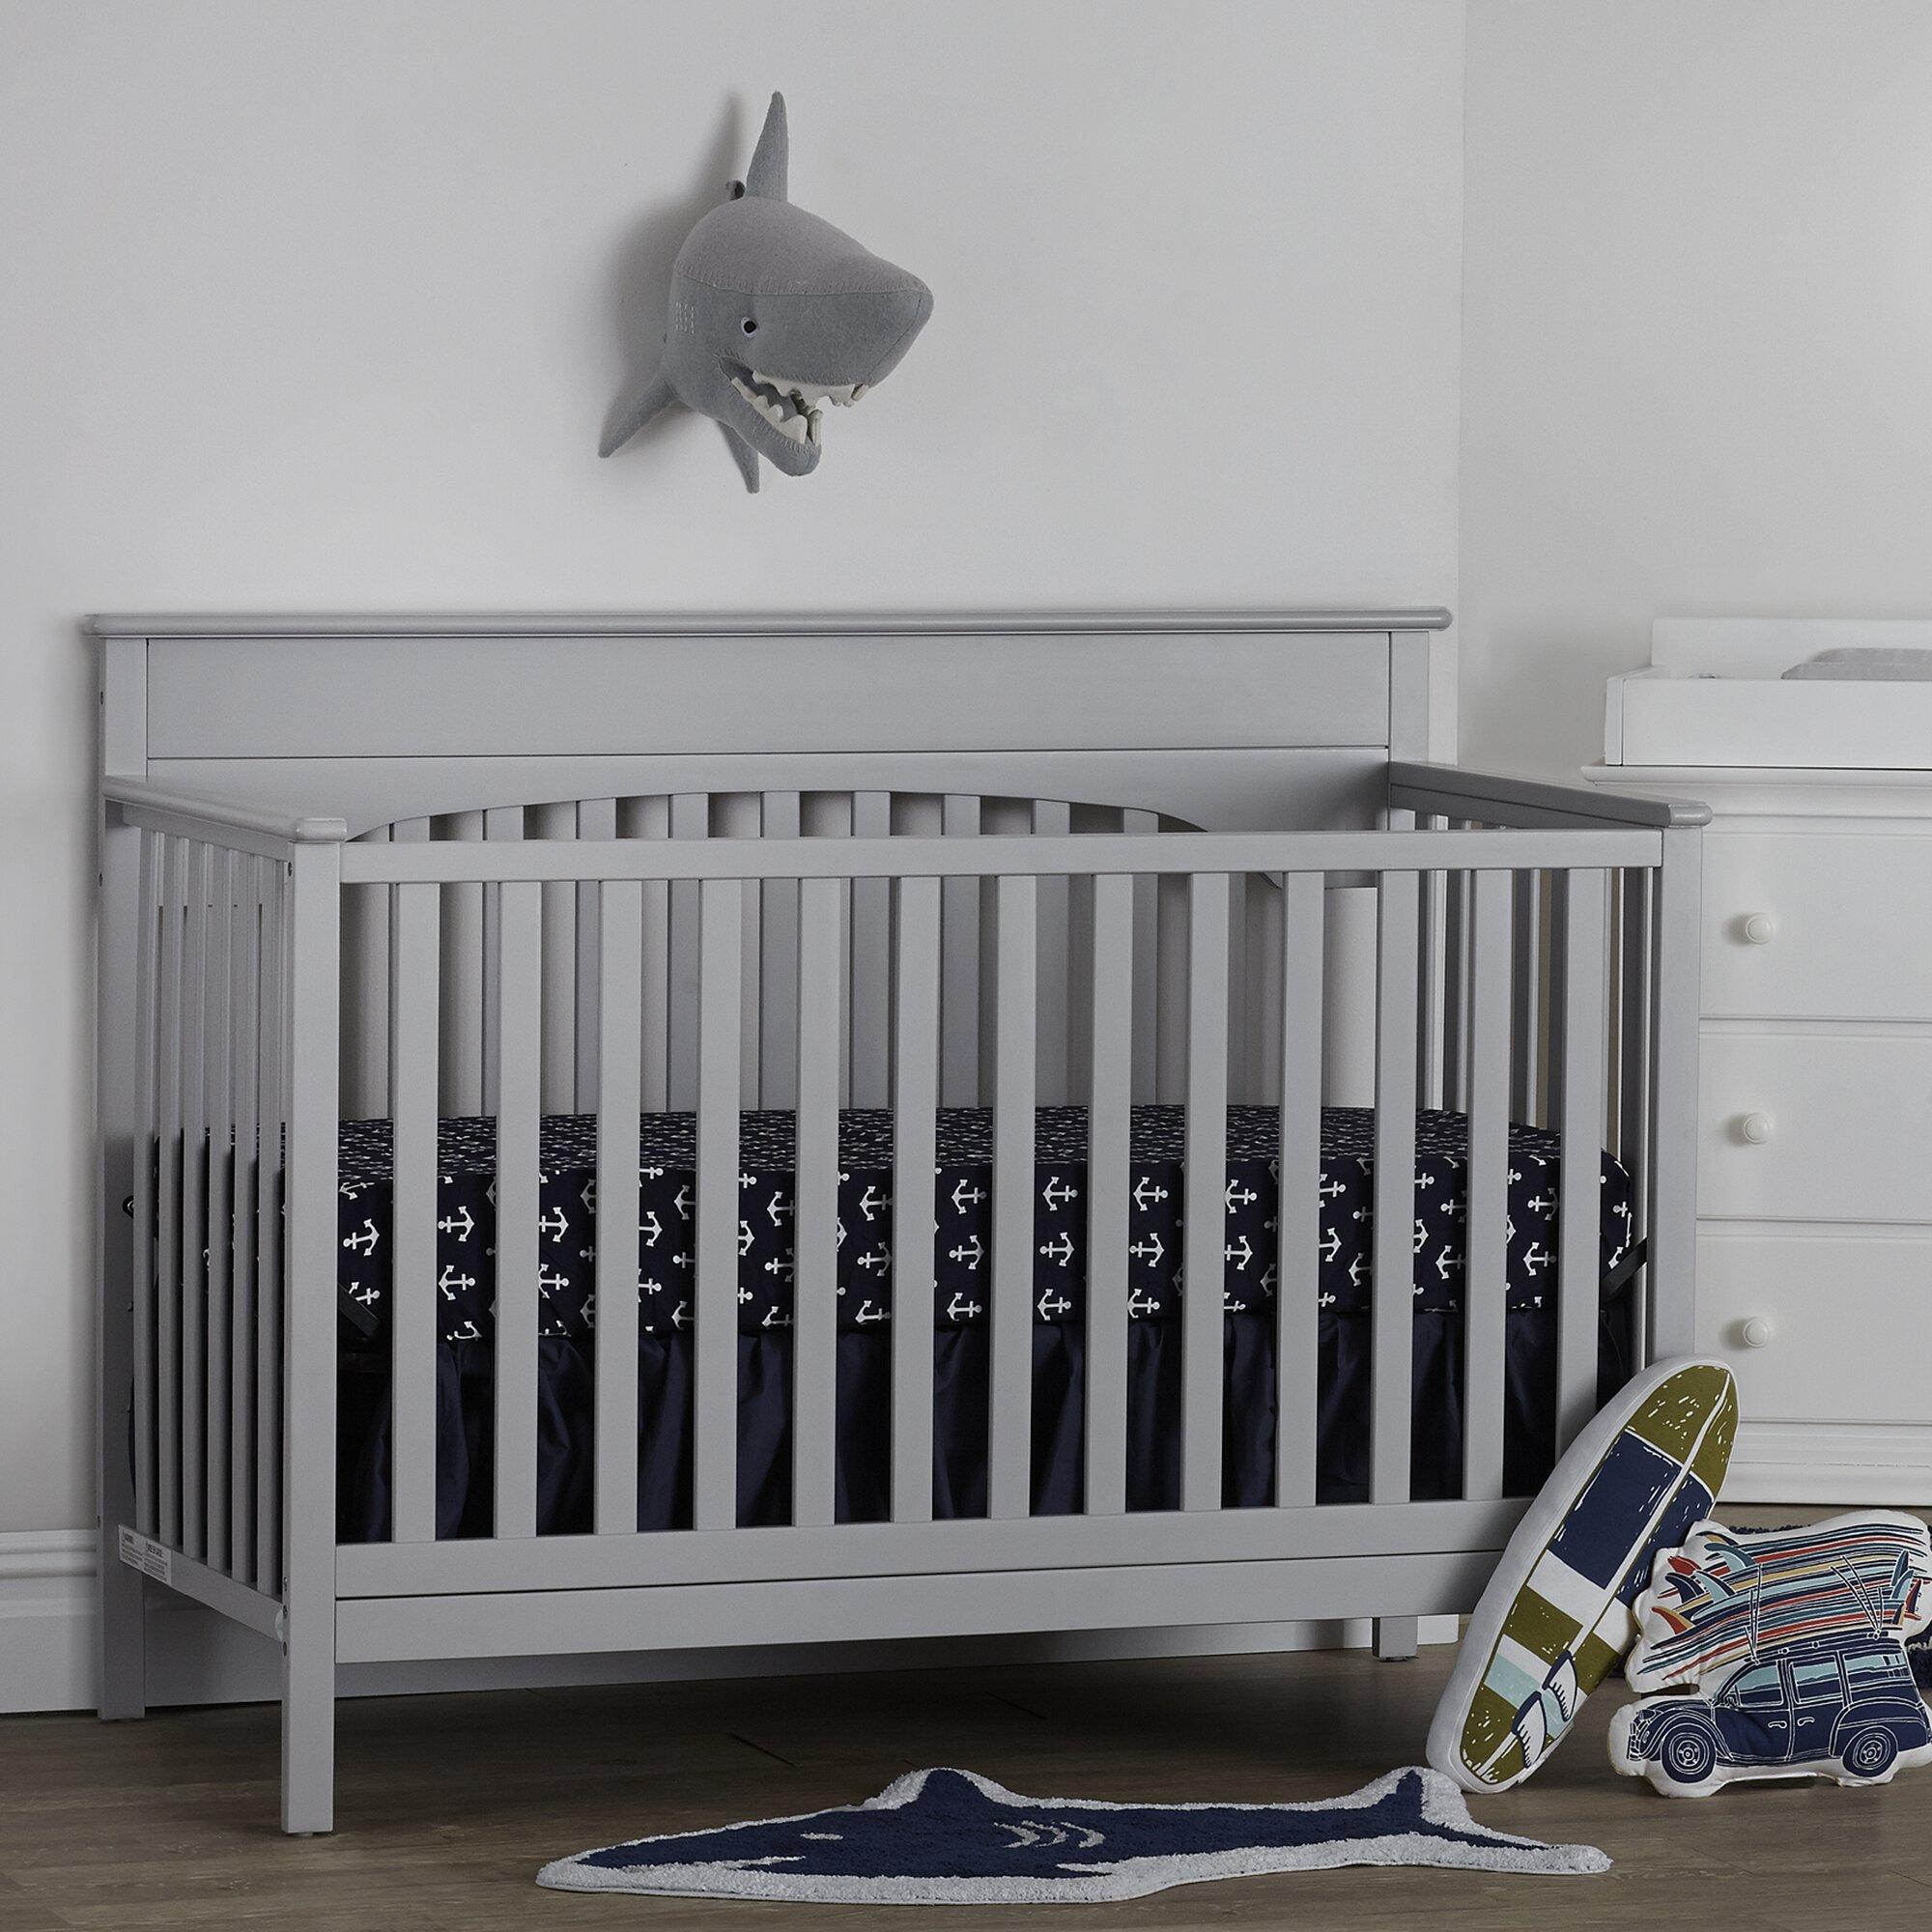 Crib for sale sheffield - Harley 3 In 1 Convertible Crib